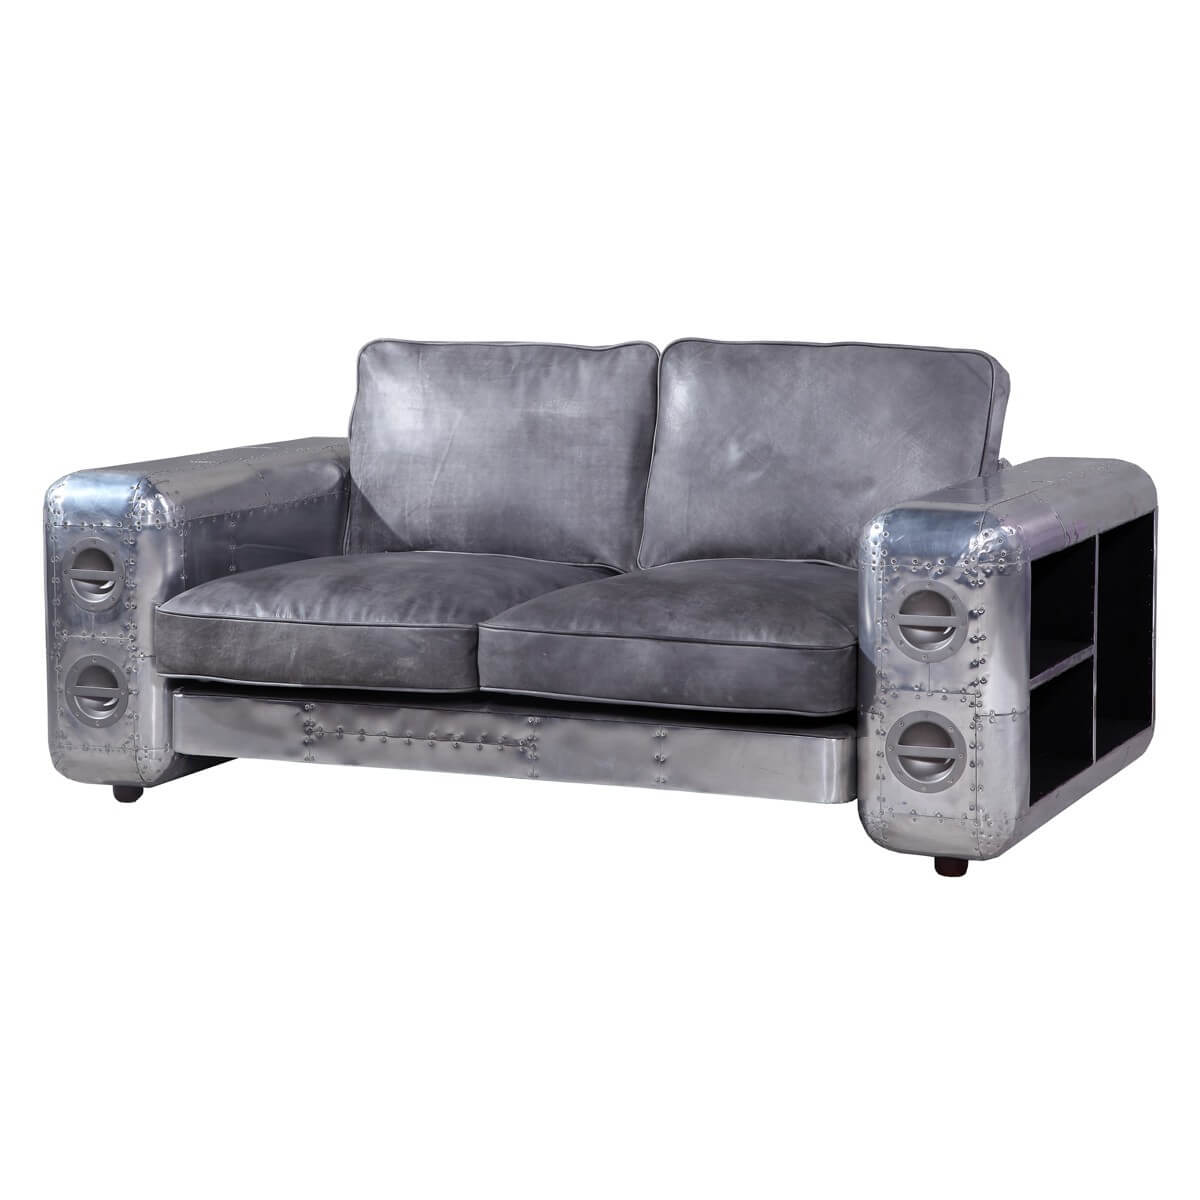 Designsofa ledersofa designercouch 2 sitzer metall echt leder silber neu ebay 2 sitzer sofa leder